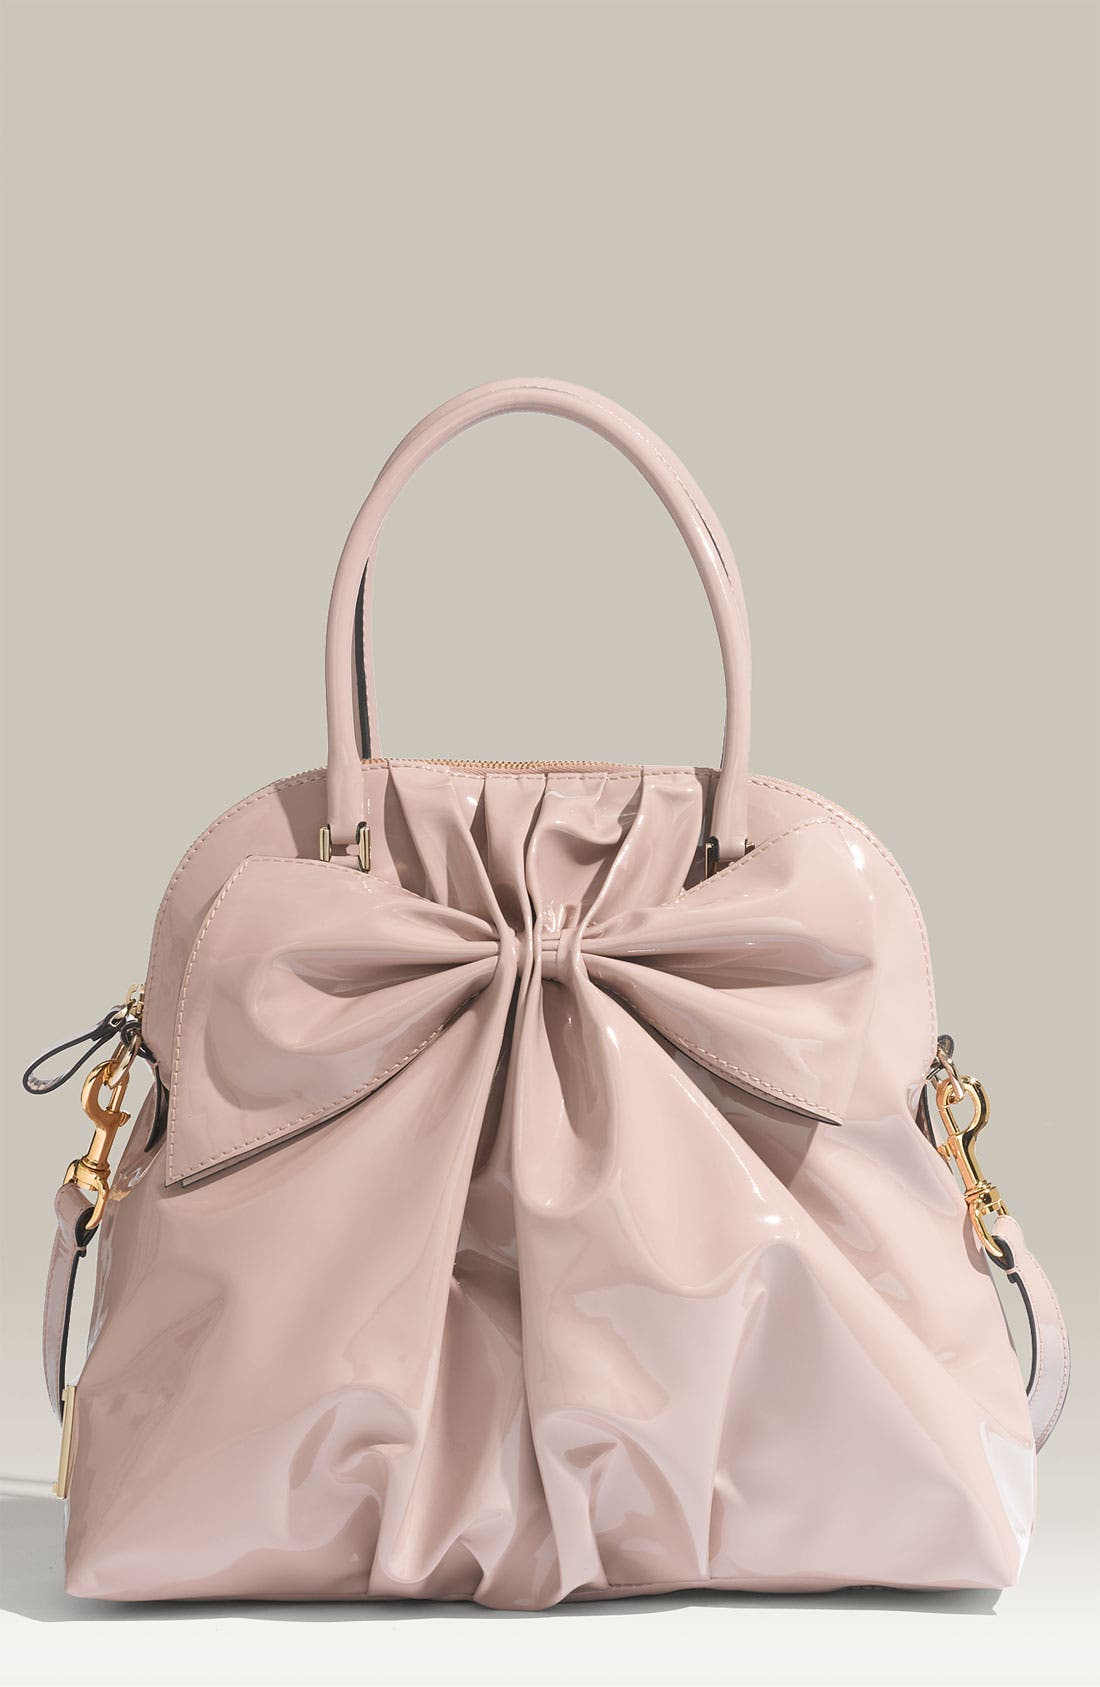 Alternate Image 1 Selected - Valentino 'Bon Bon Dome Bow' Patent Leather Satchel